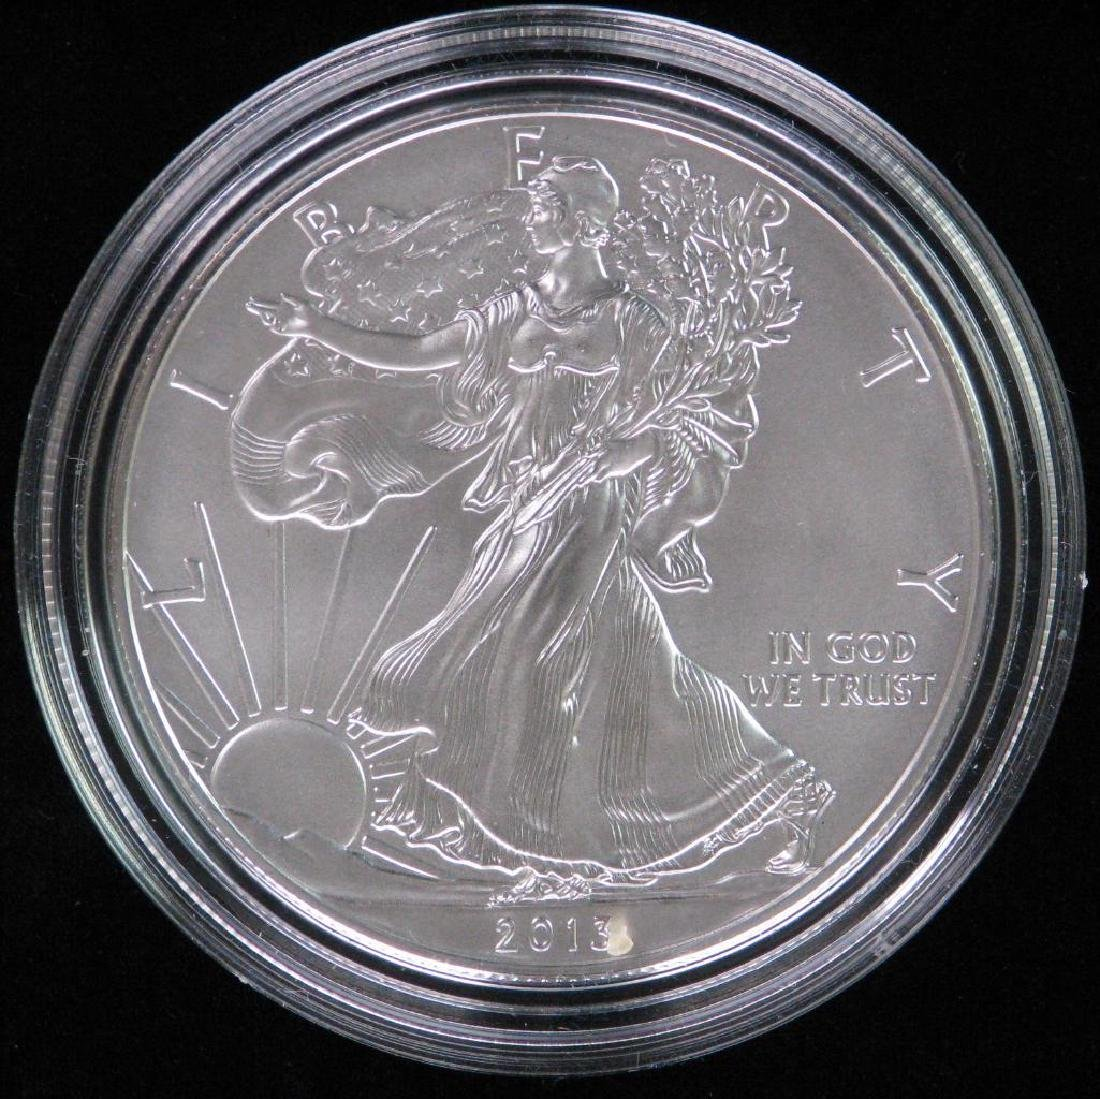 2013-W American Silver Eagle - Uncirculated